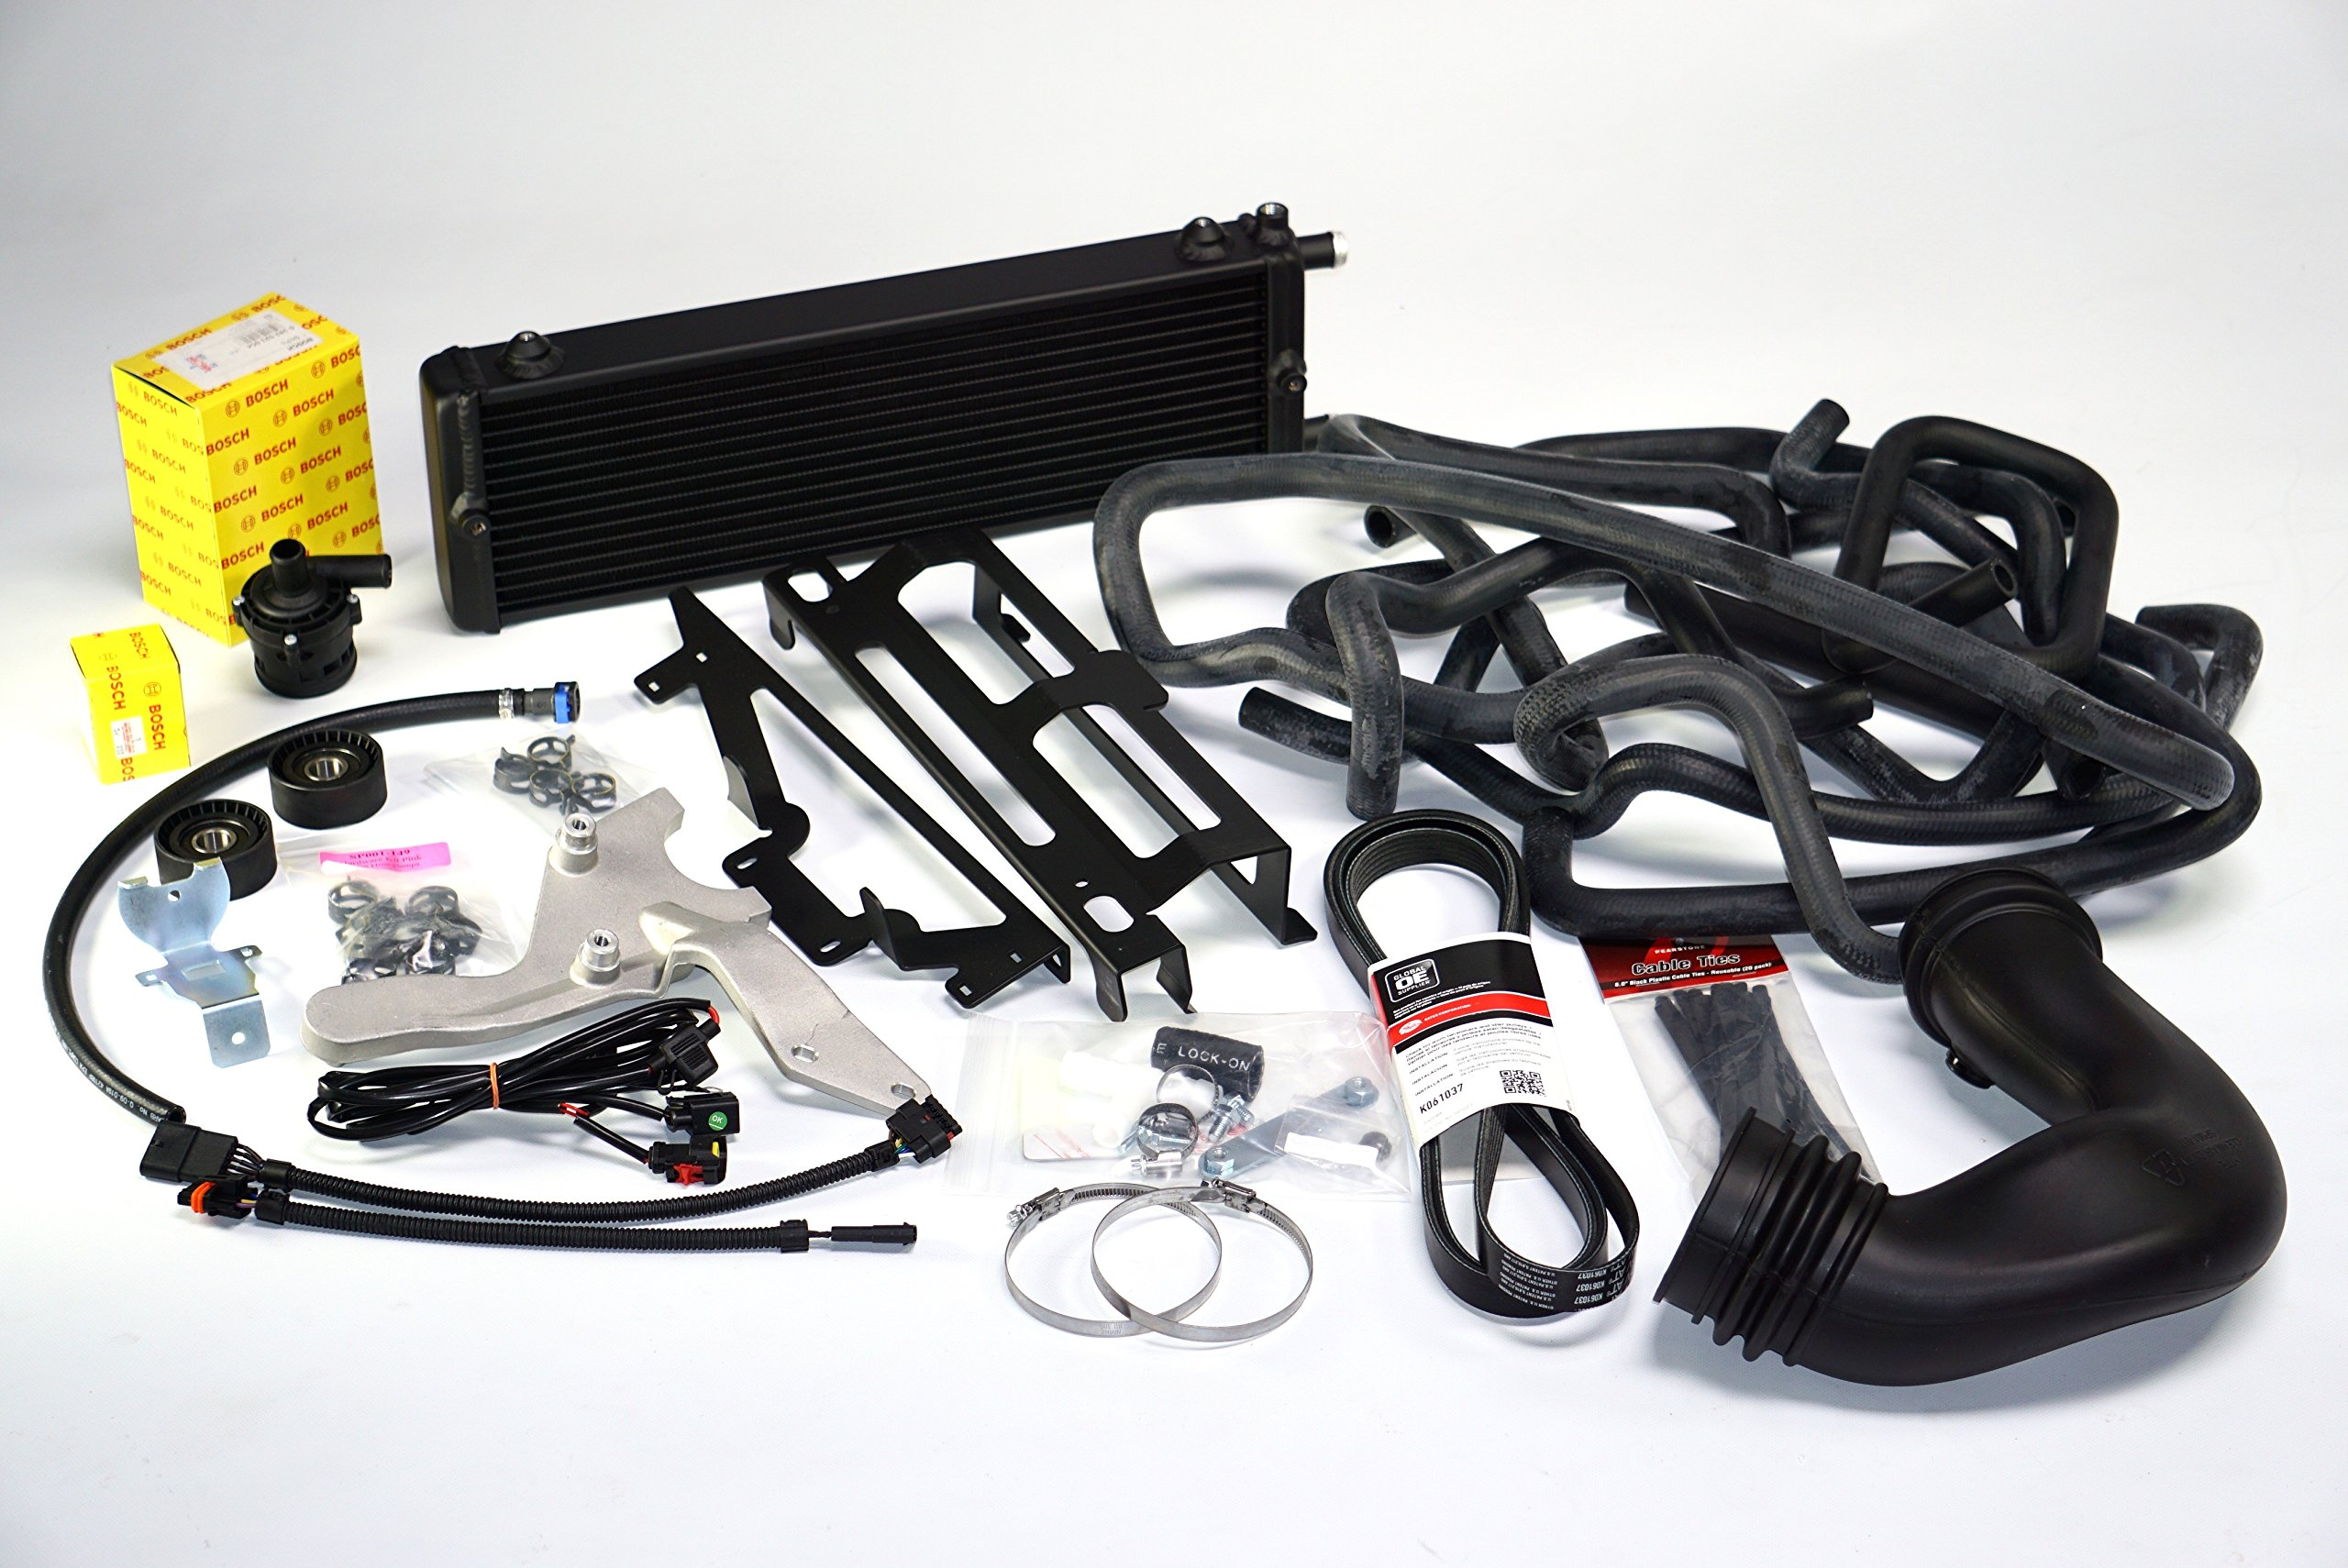 Sprintex 264A1001 Black Standard Intercooler Upgrade Kit Jeep JK 3.8L Intercooler upgrade kit